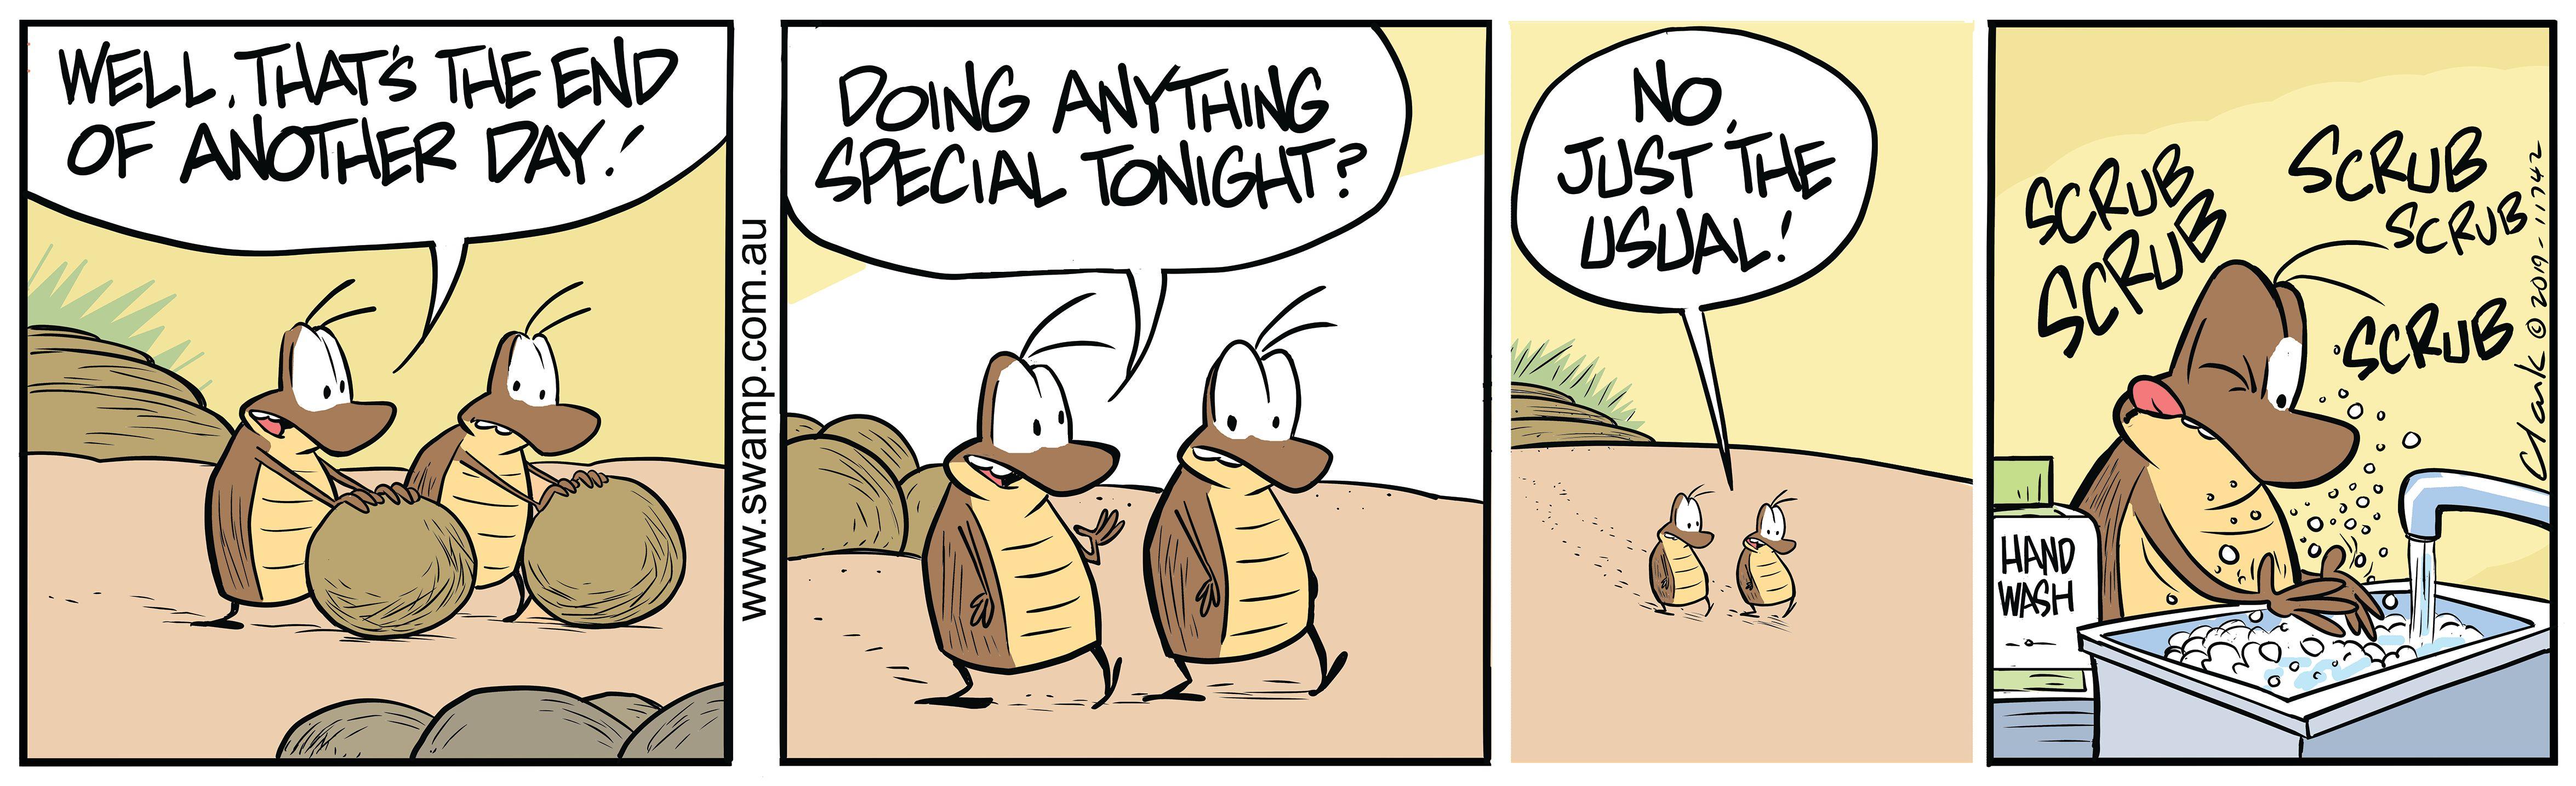 Dung Beetle Hand Wash